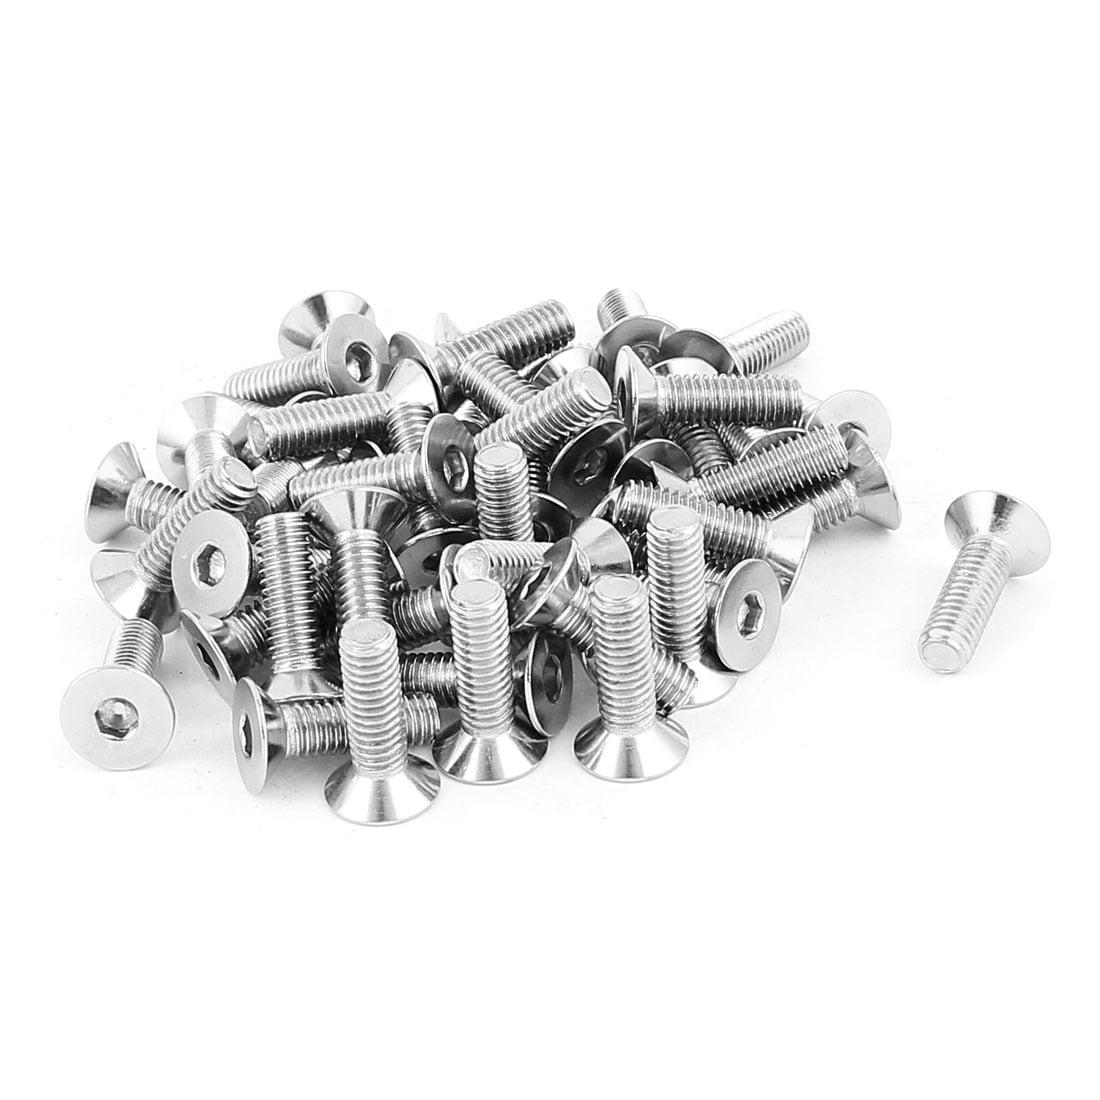 Pack of 20 M4 12mm Pan Round Head Hex Socket SS Screw Bolt T-Slot Aluminum